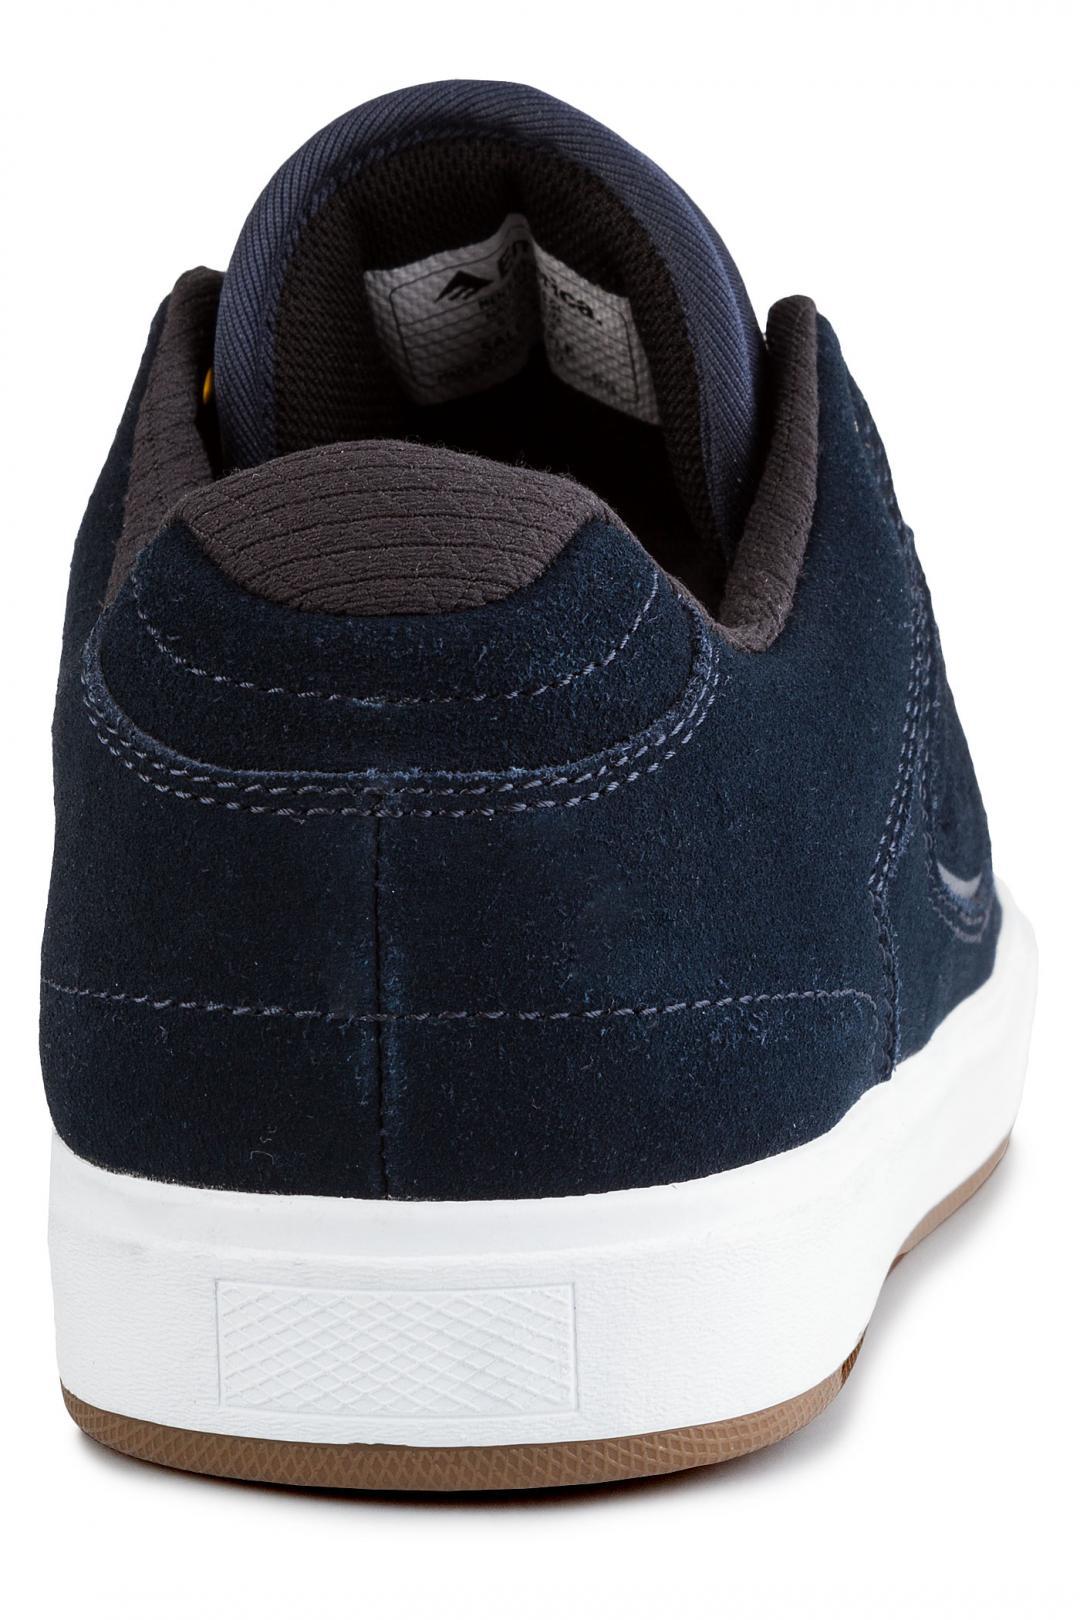 Uomo Emerica Reynolds G6 navy white gum | Sneaker